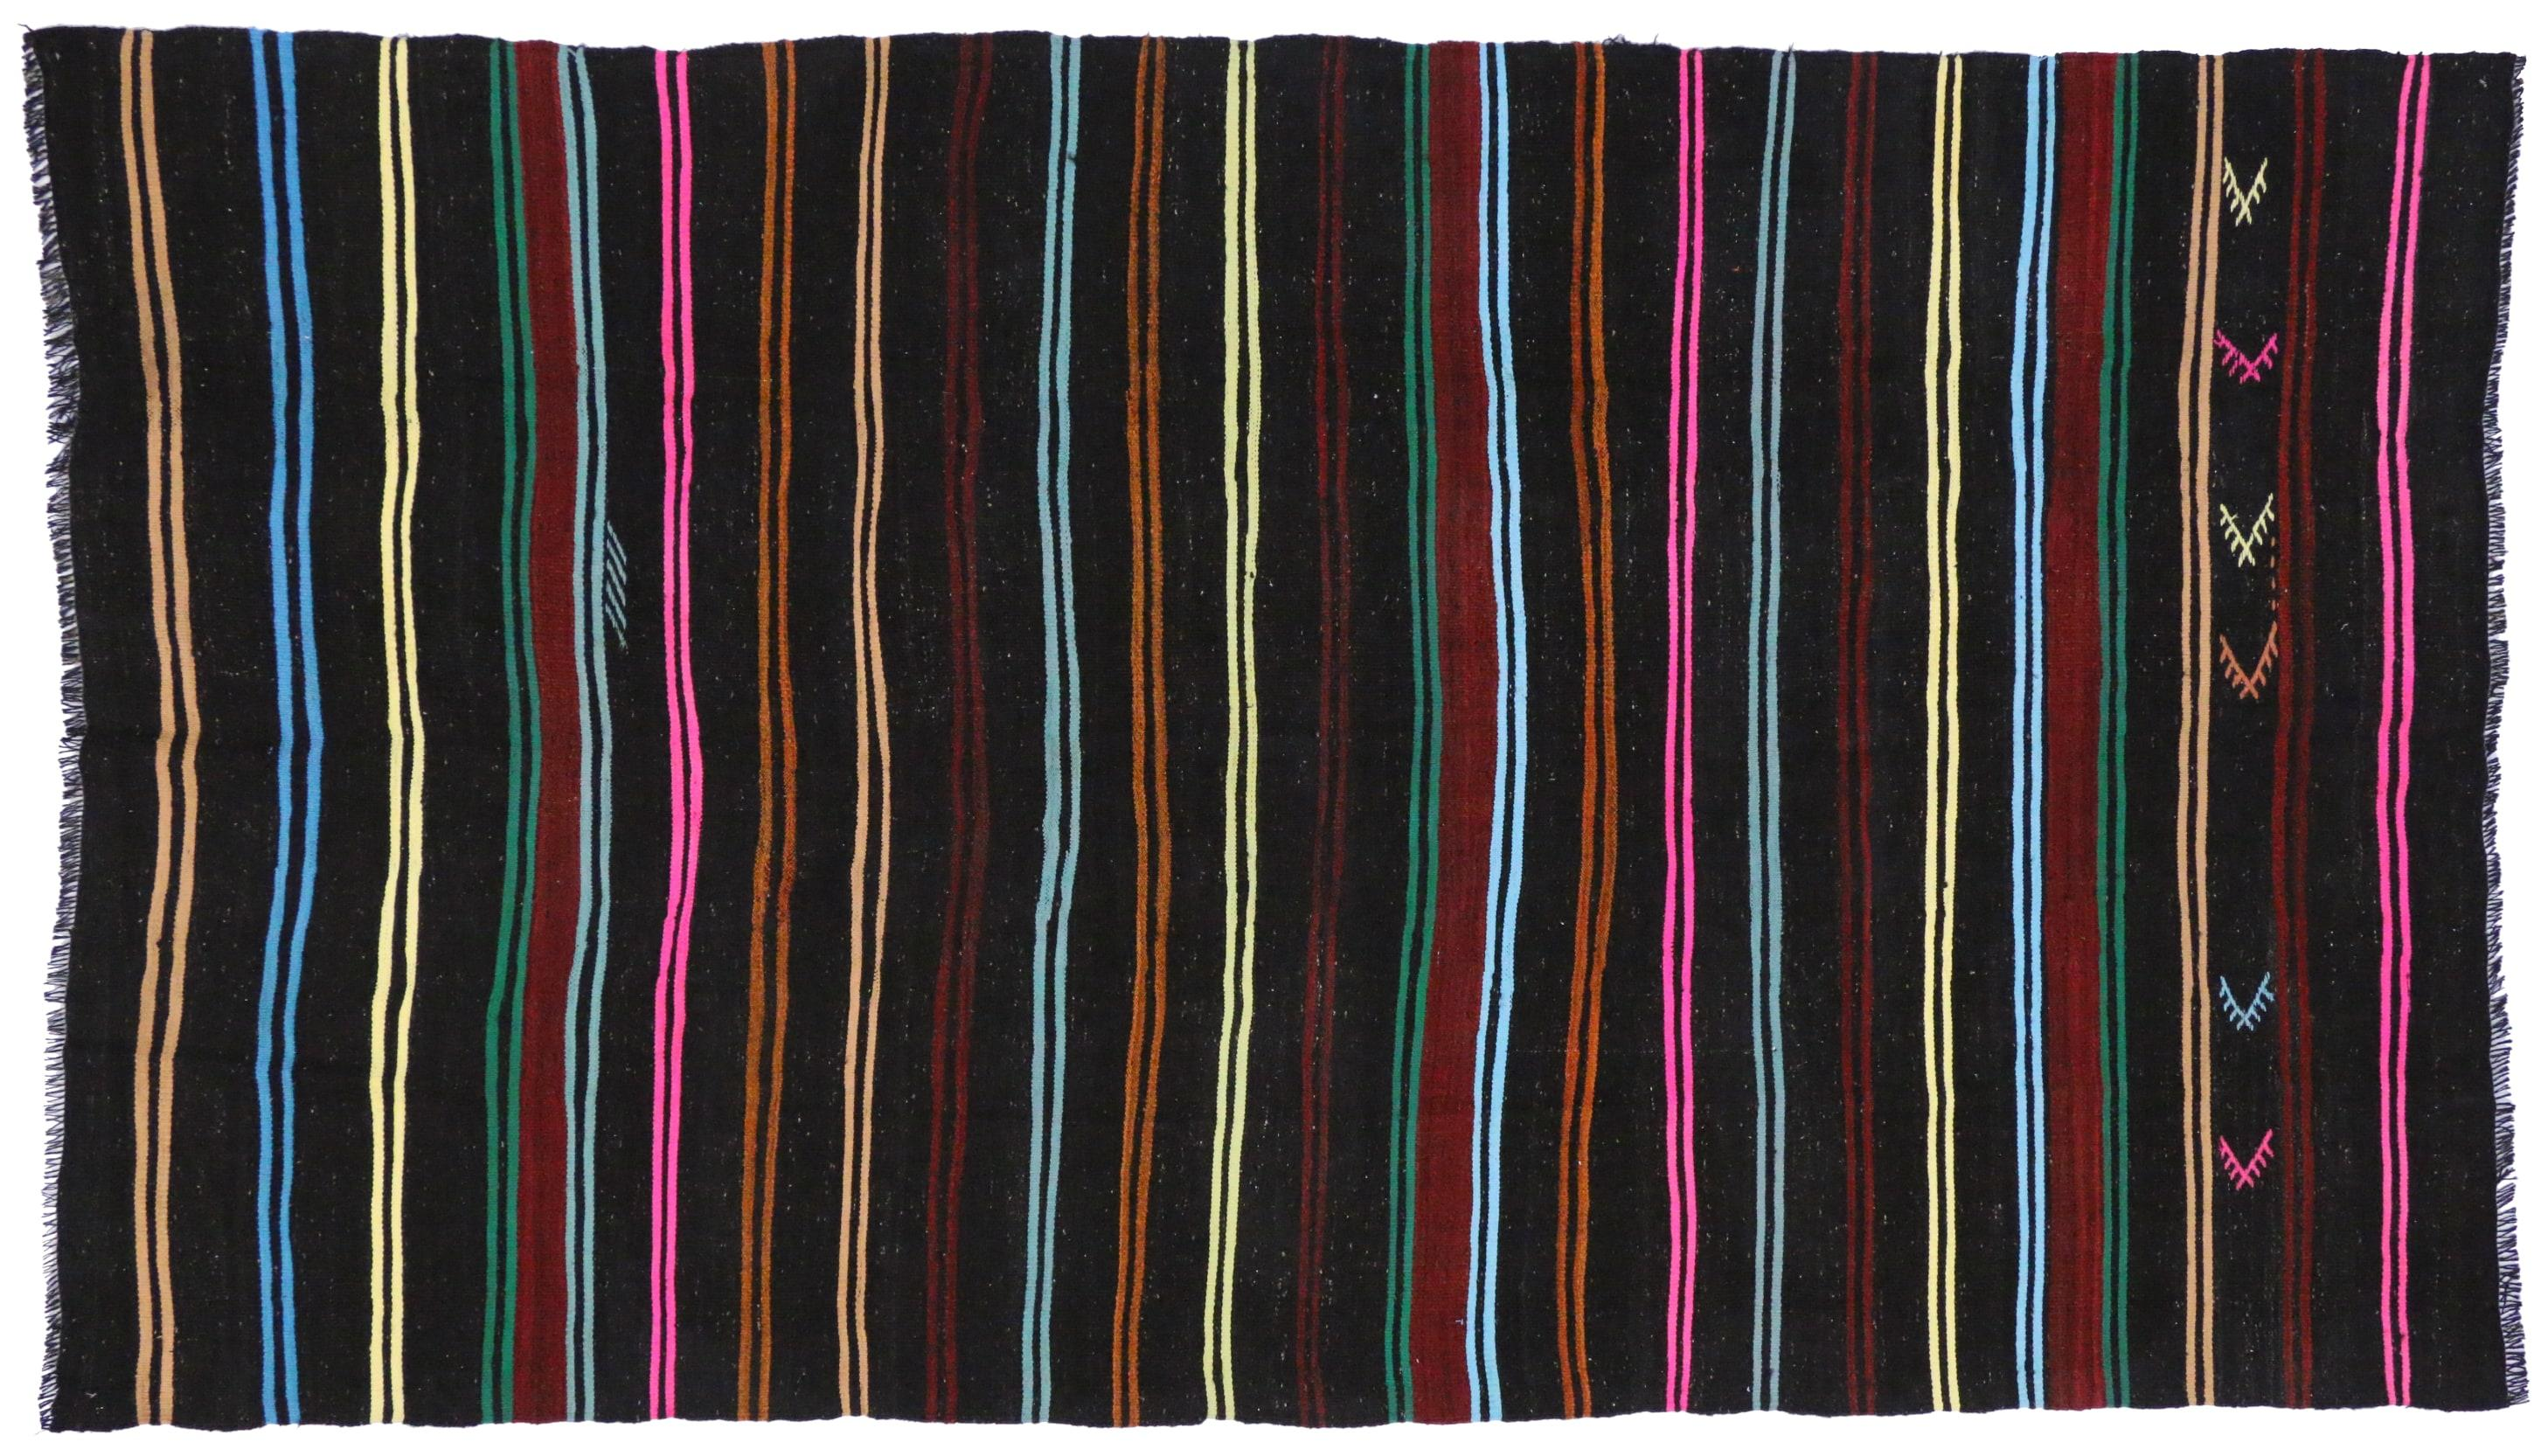 Boho Chic Vintage Turkish Kilim With Stripes And Modern